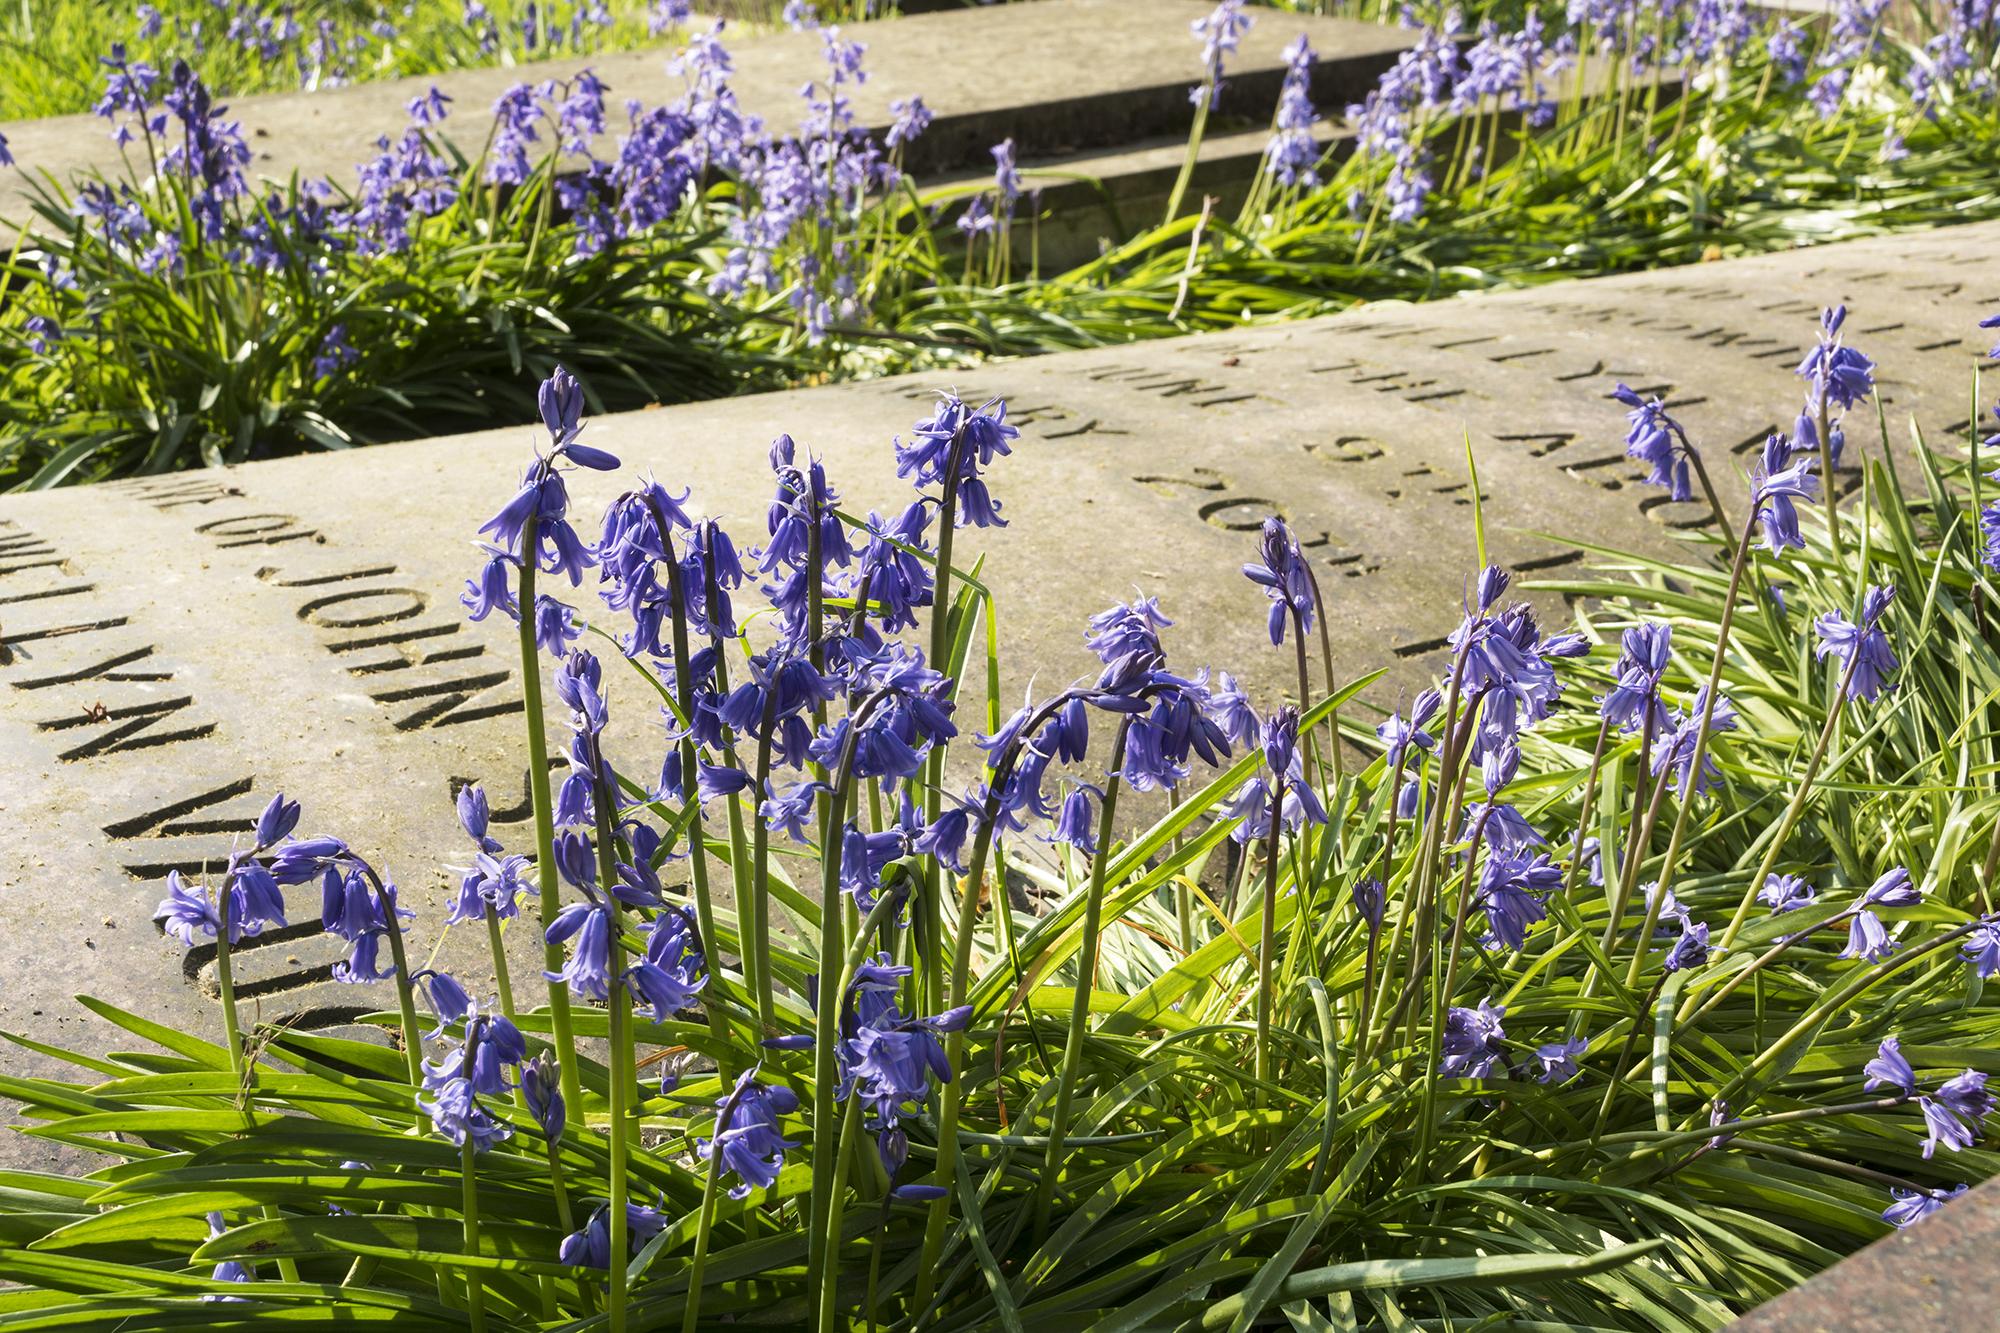 2017-04-08-Brompton-Cemetery-Bluebellw